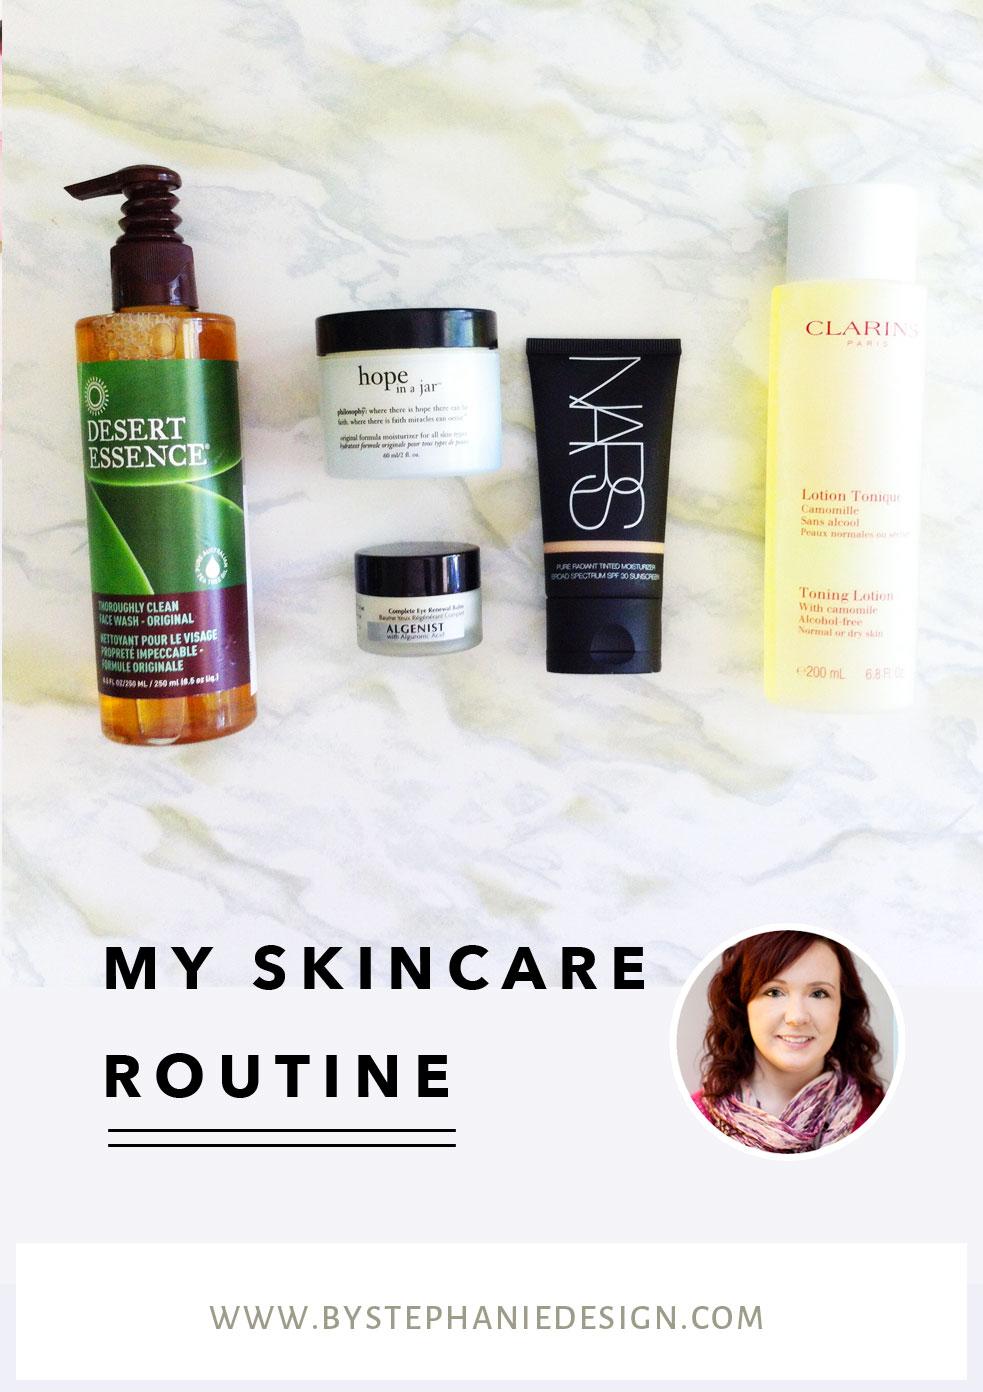 my nighttime skincare routine - by stephanie design